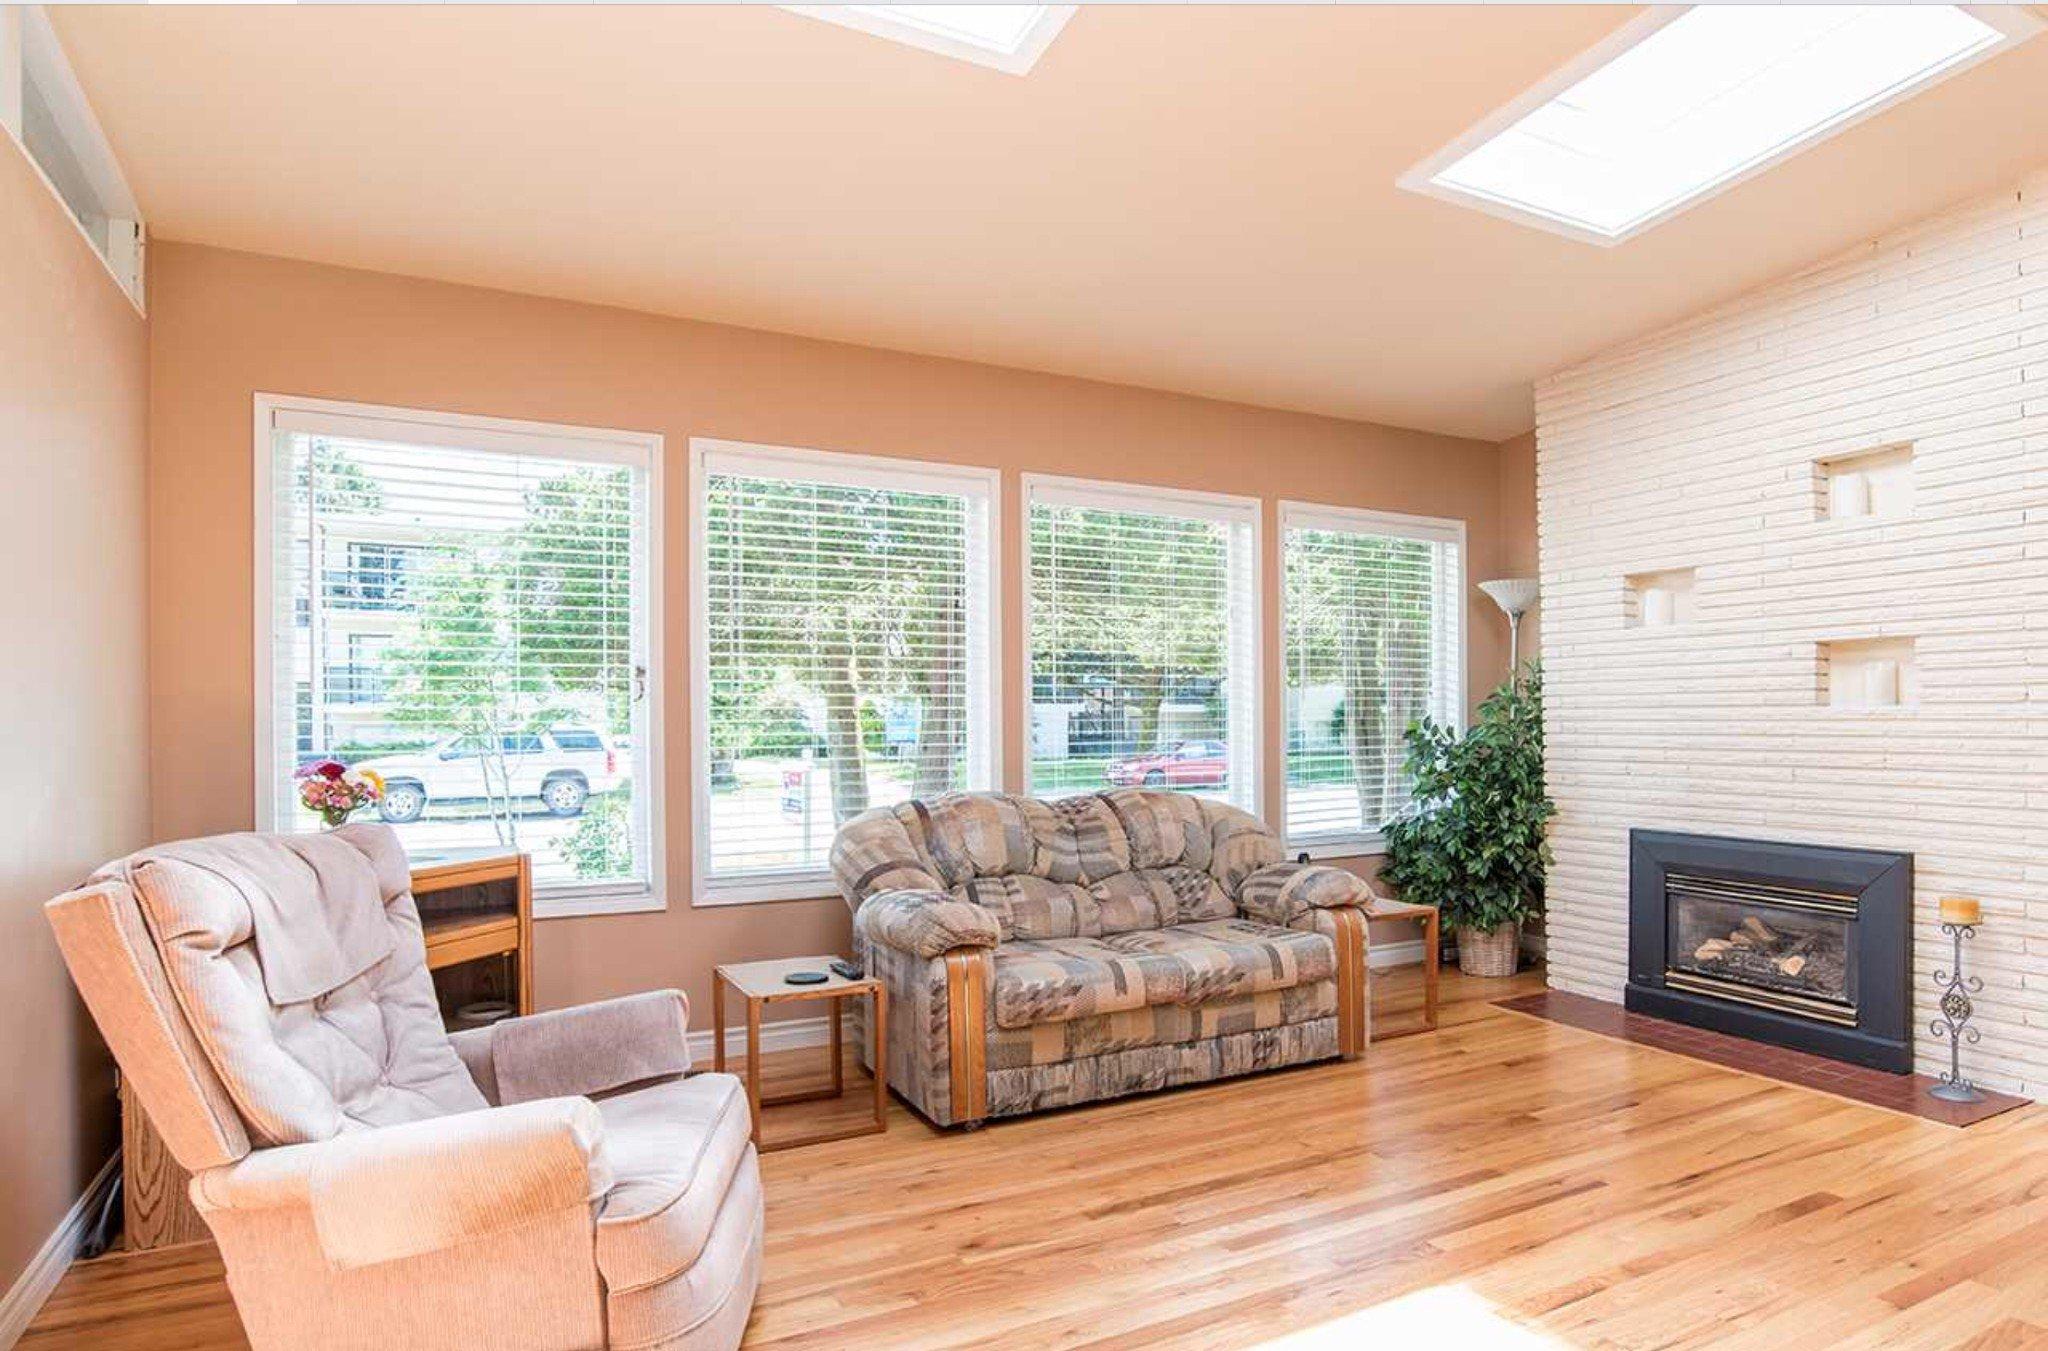 Photo 3: Photos: 10327 127A Street in Surrey: Cedar Hills House for sale : MLS®# R2178137